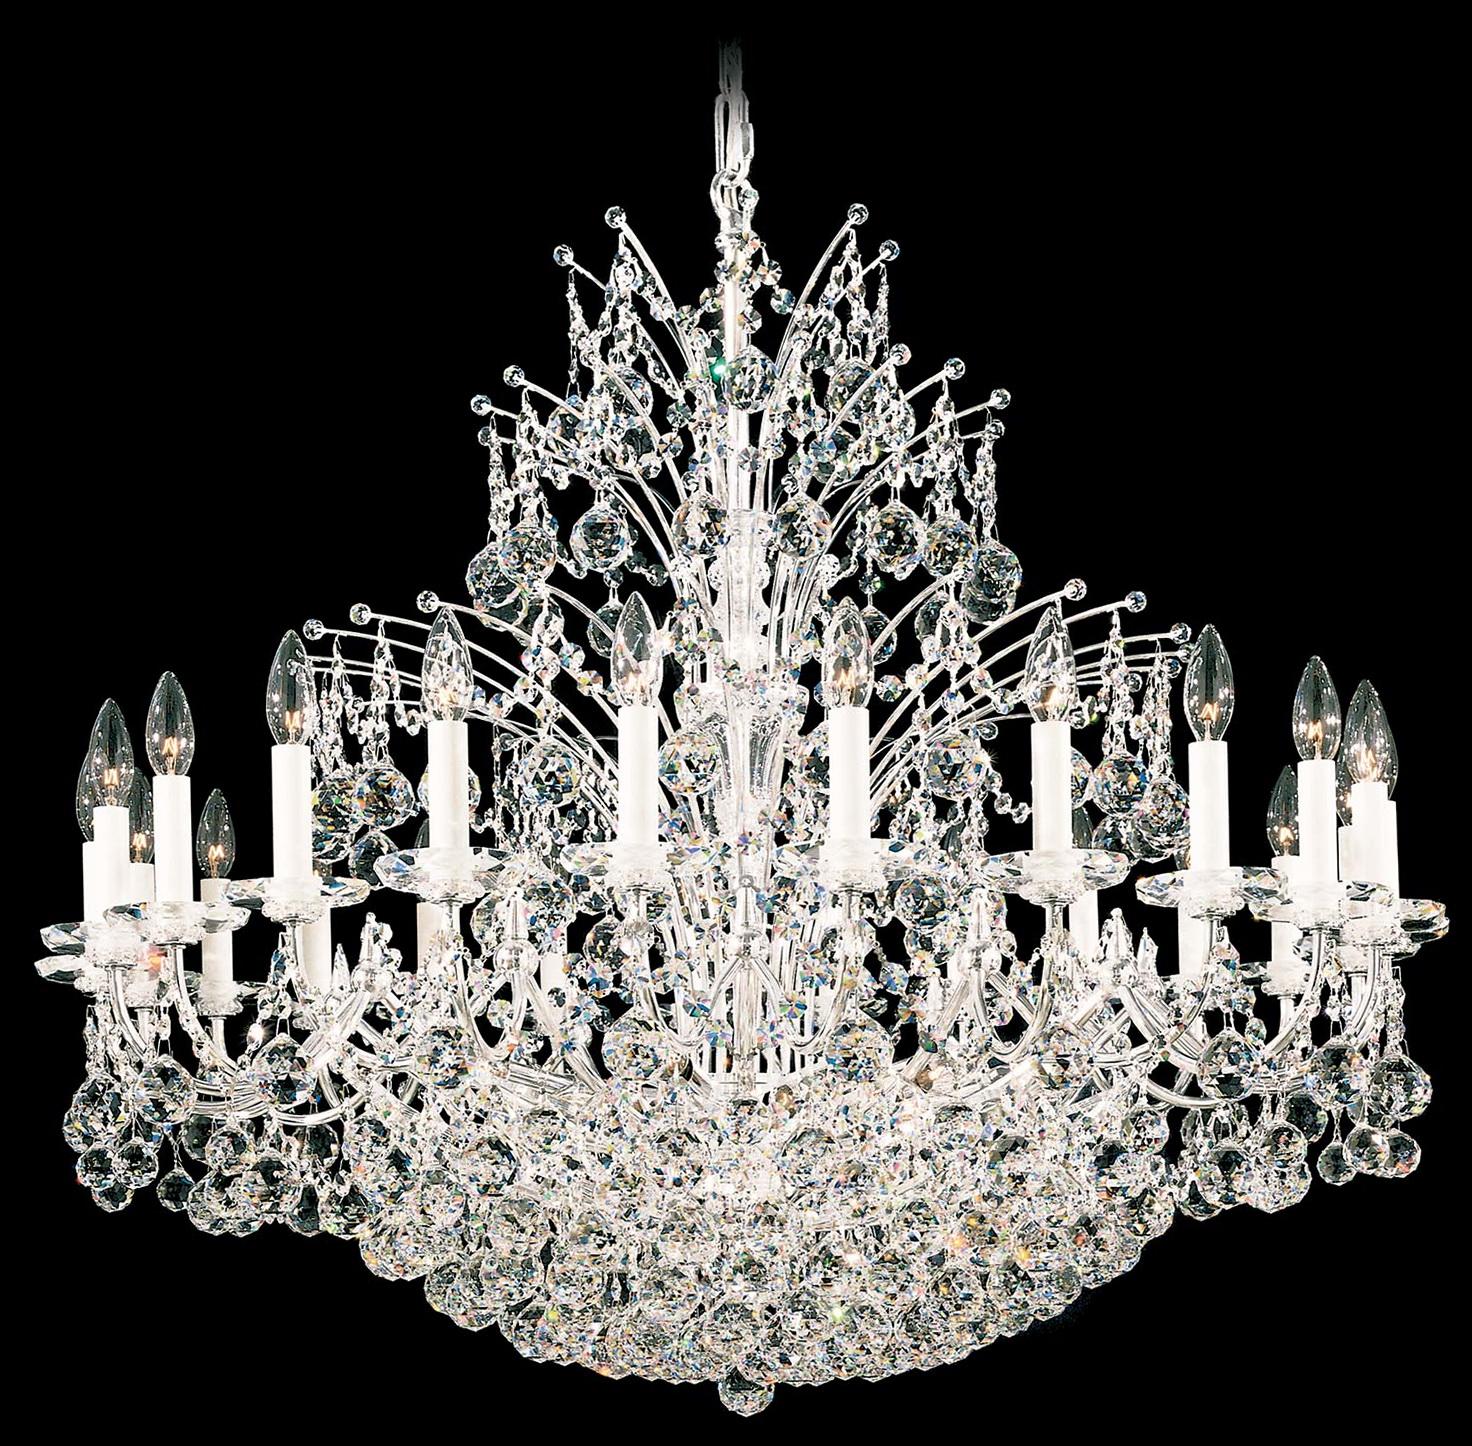 Schonbek Crystal Chandelier Prices